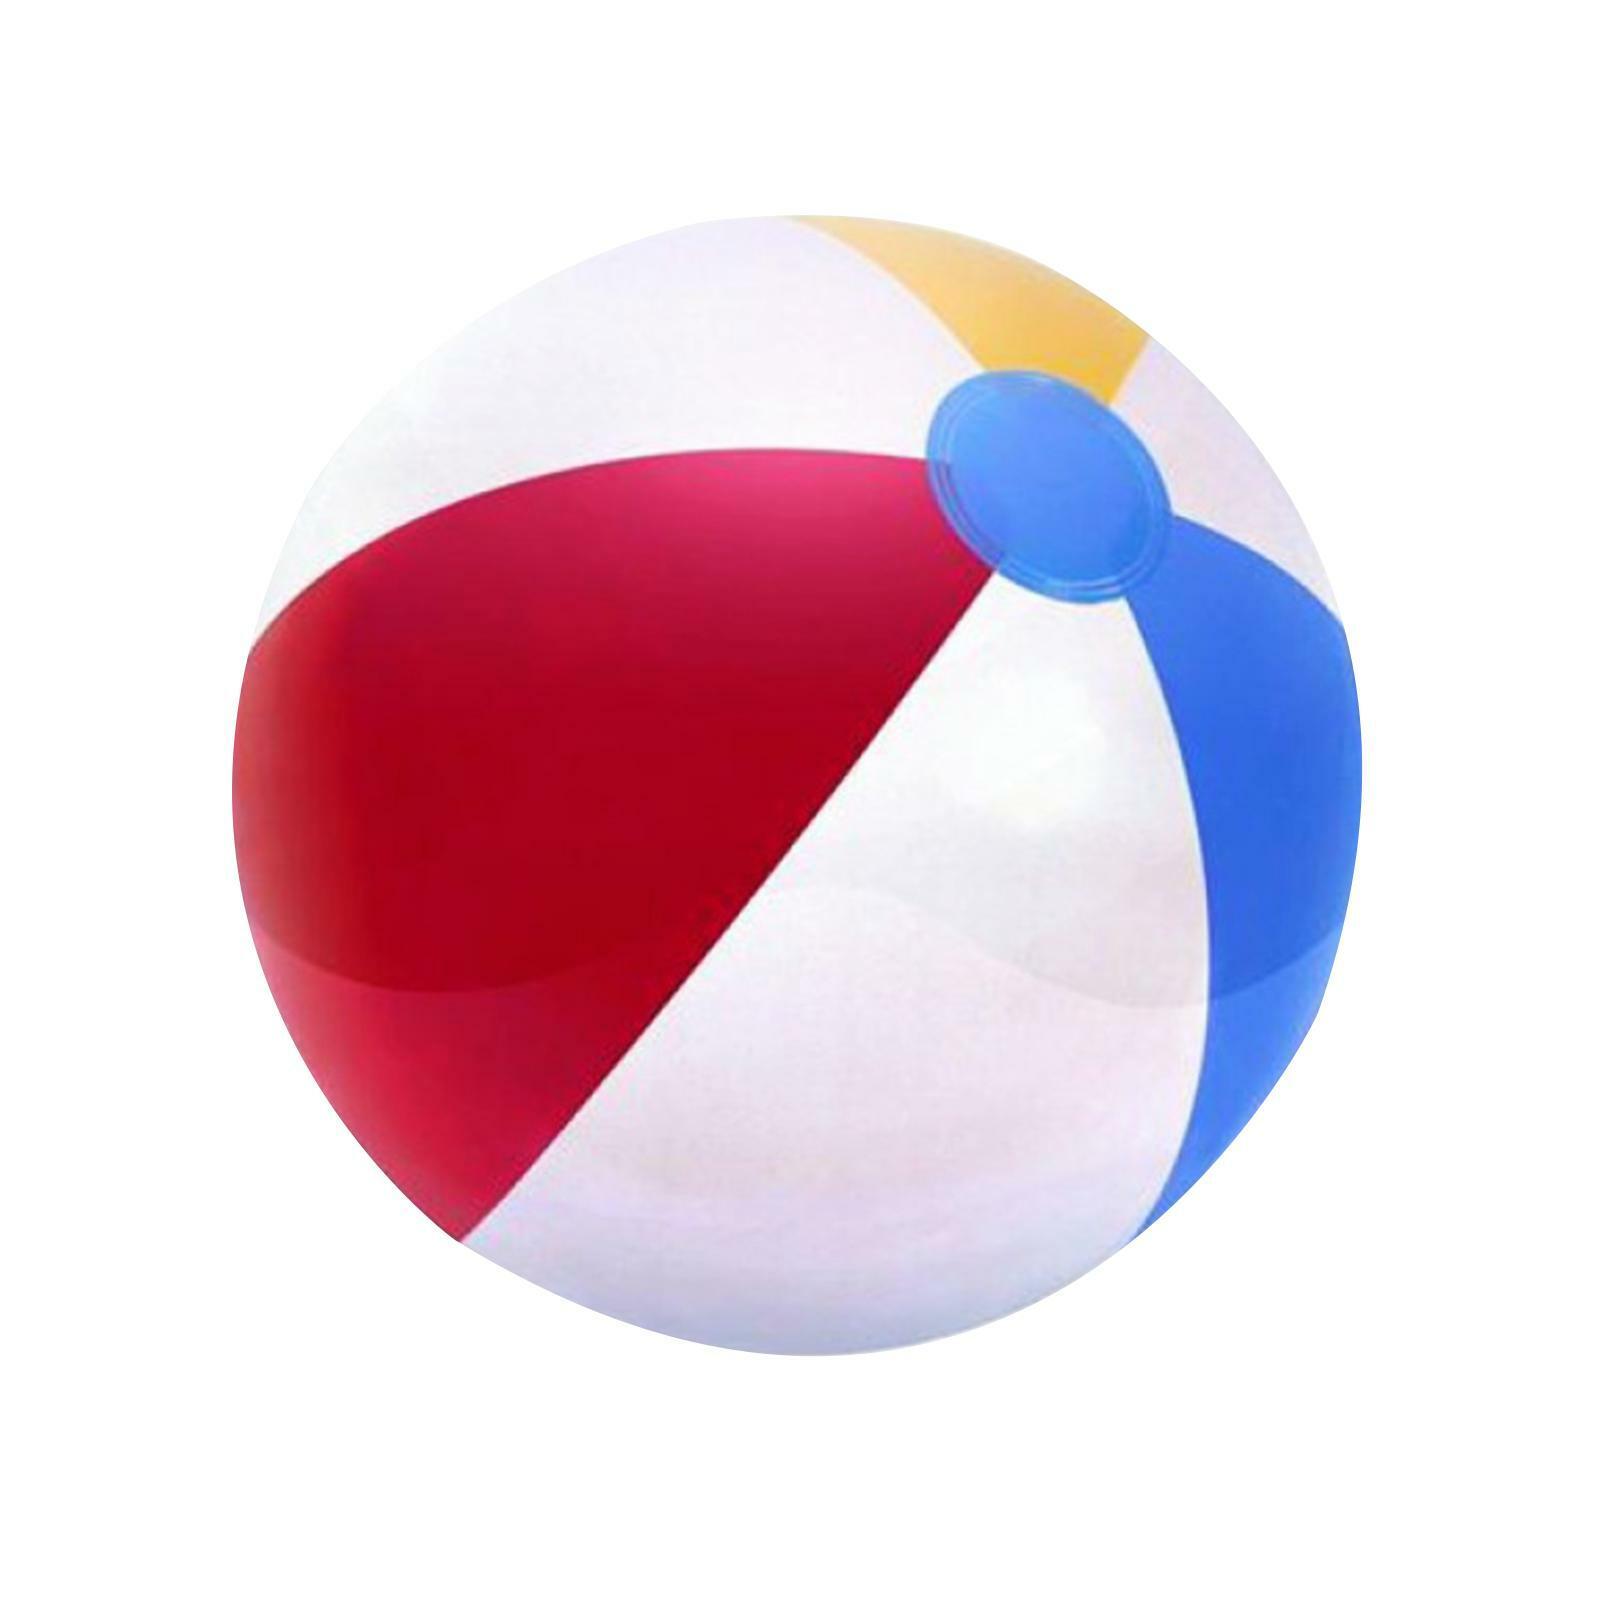 pallone gonfiabile mare/piscina bestway 31021